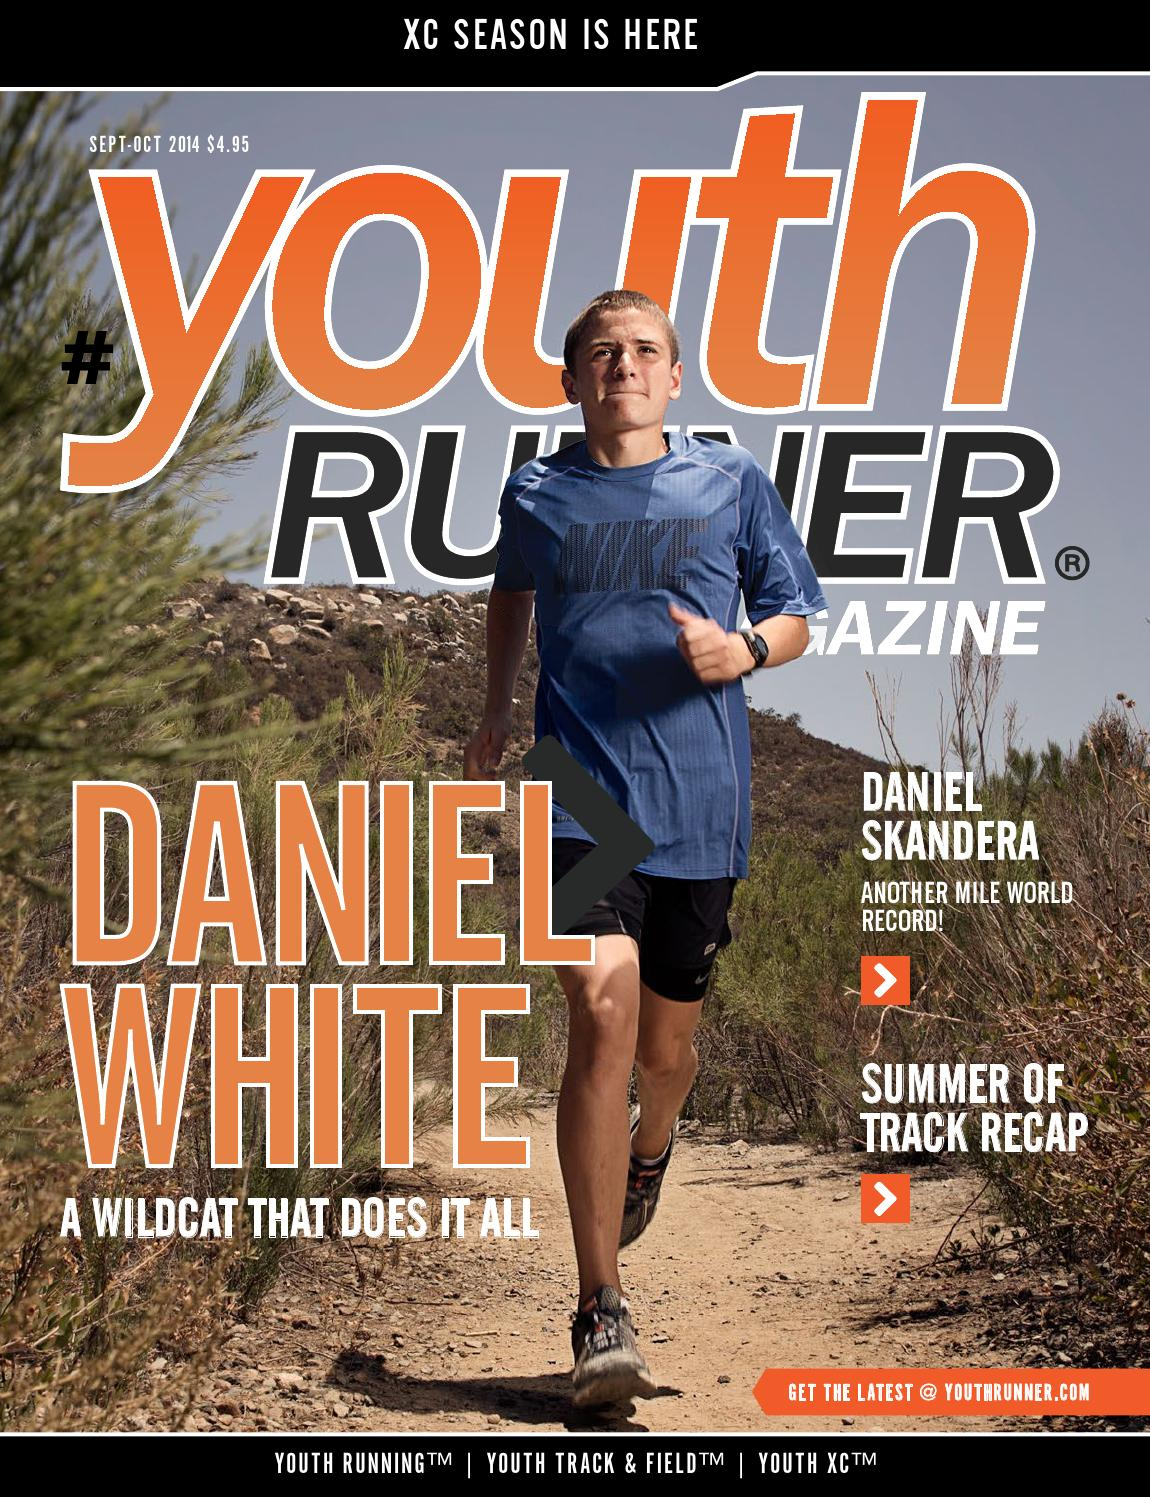 Youth Runner Magazine Sept Oct 2014 by Gosportz Media, LLC